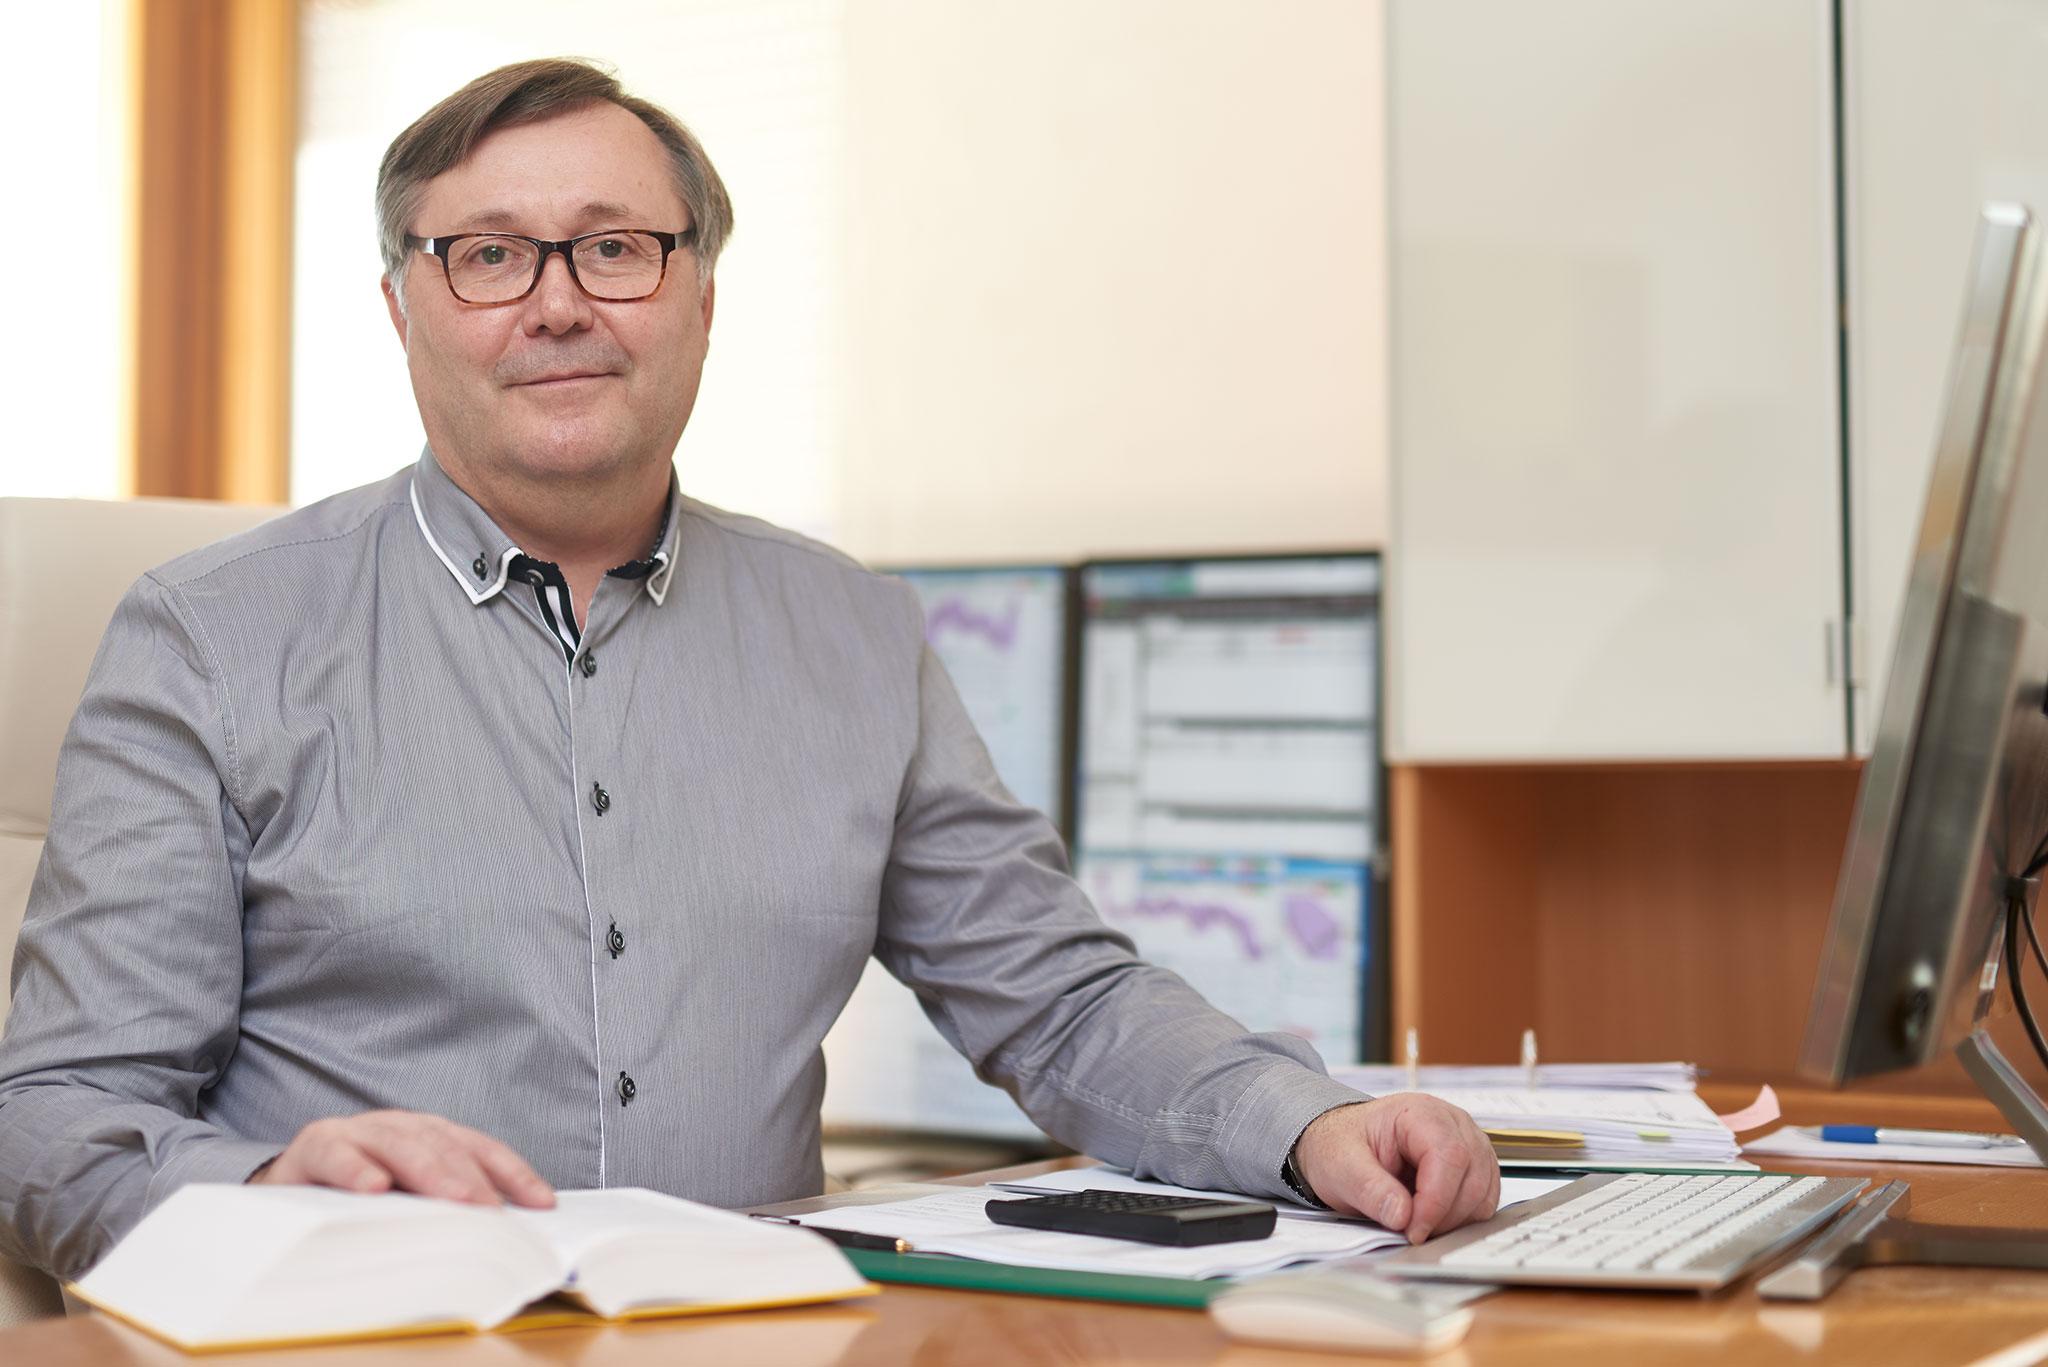 Dr. Wolfgang Kellermair - Ueber uns